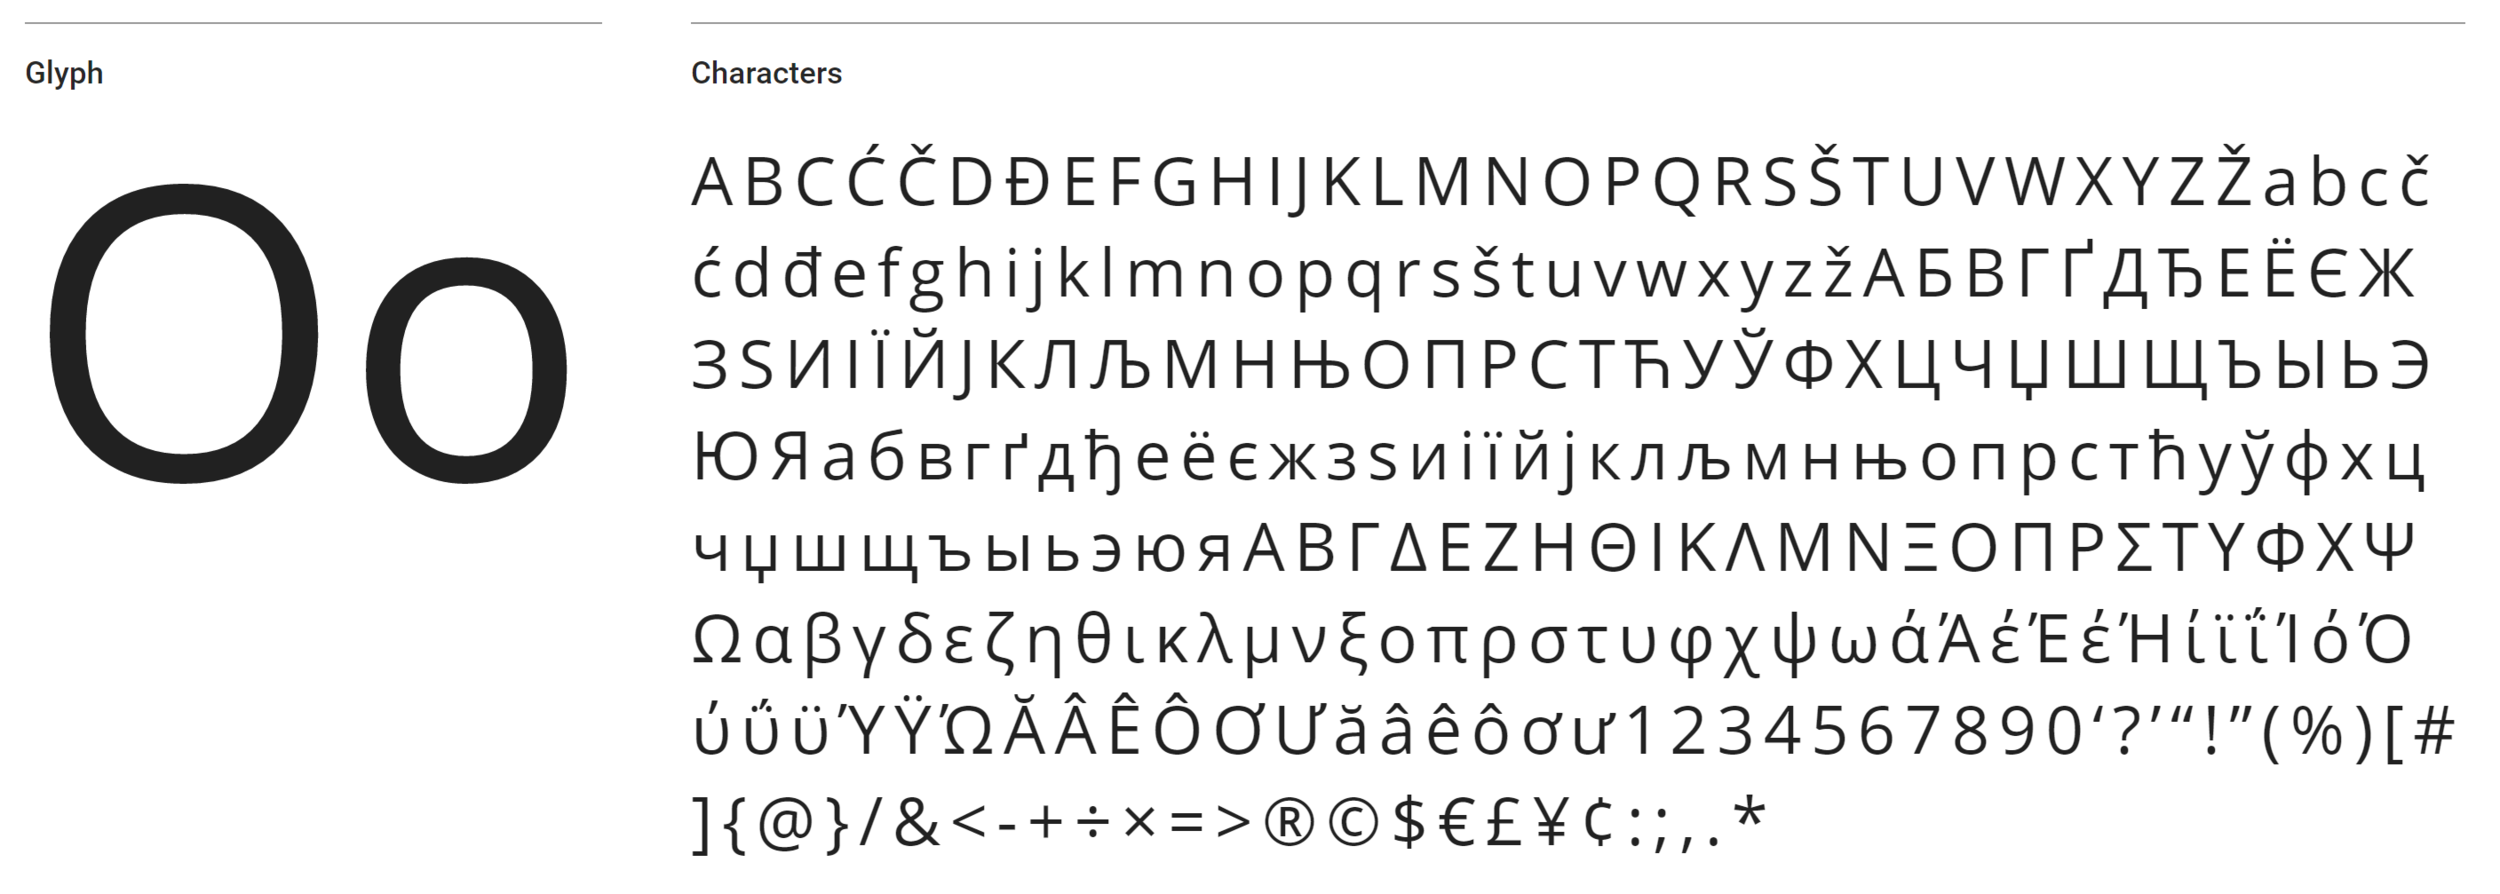 https://fonts.google.com/specimen/Open+Sans